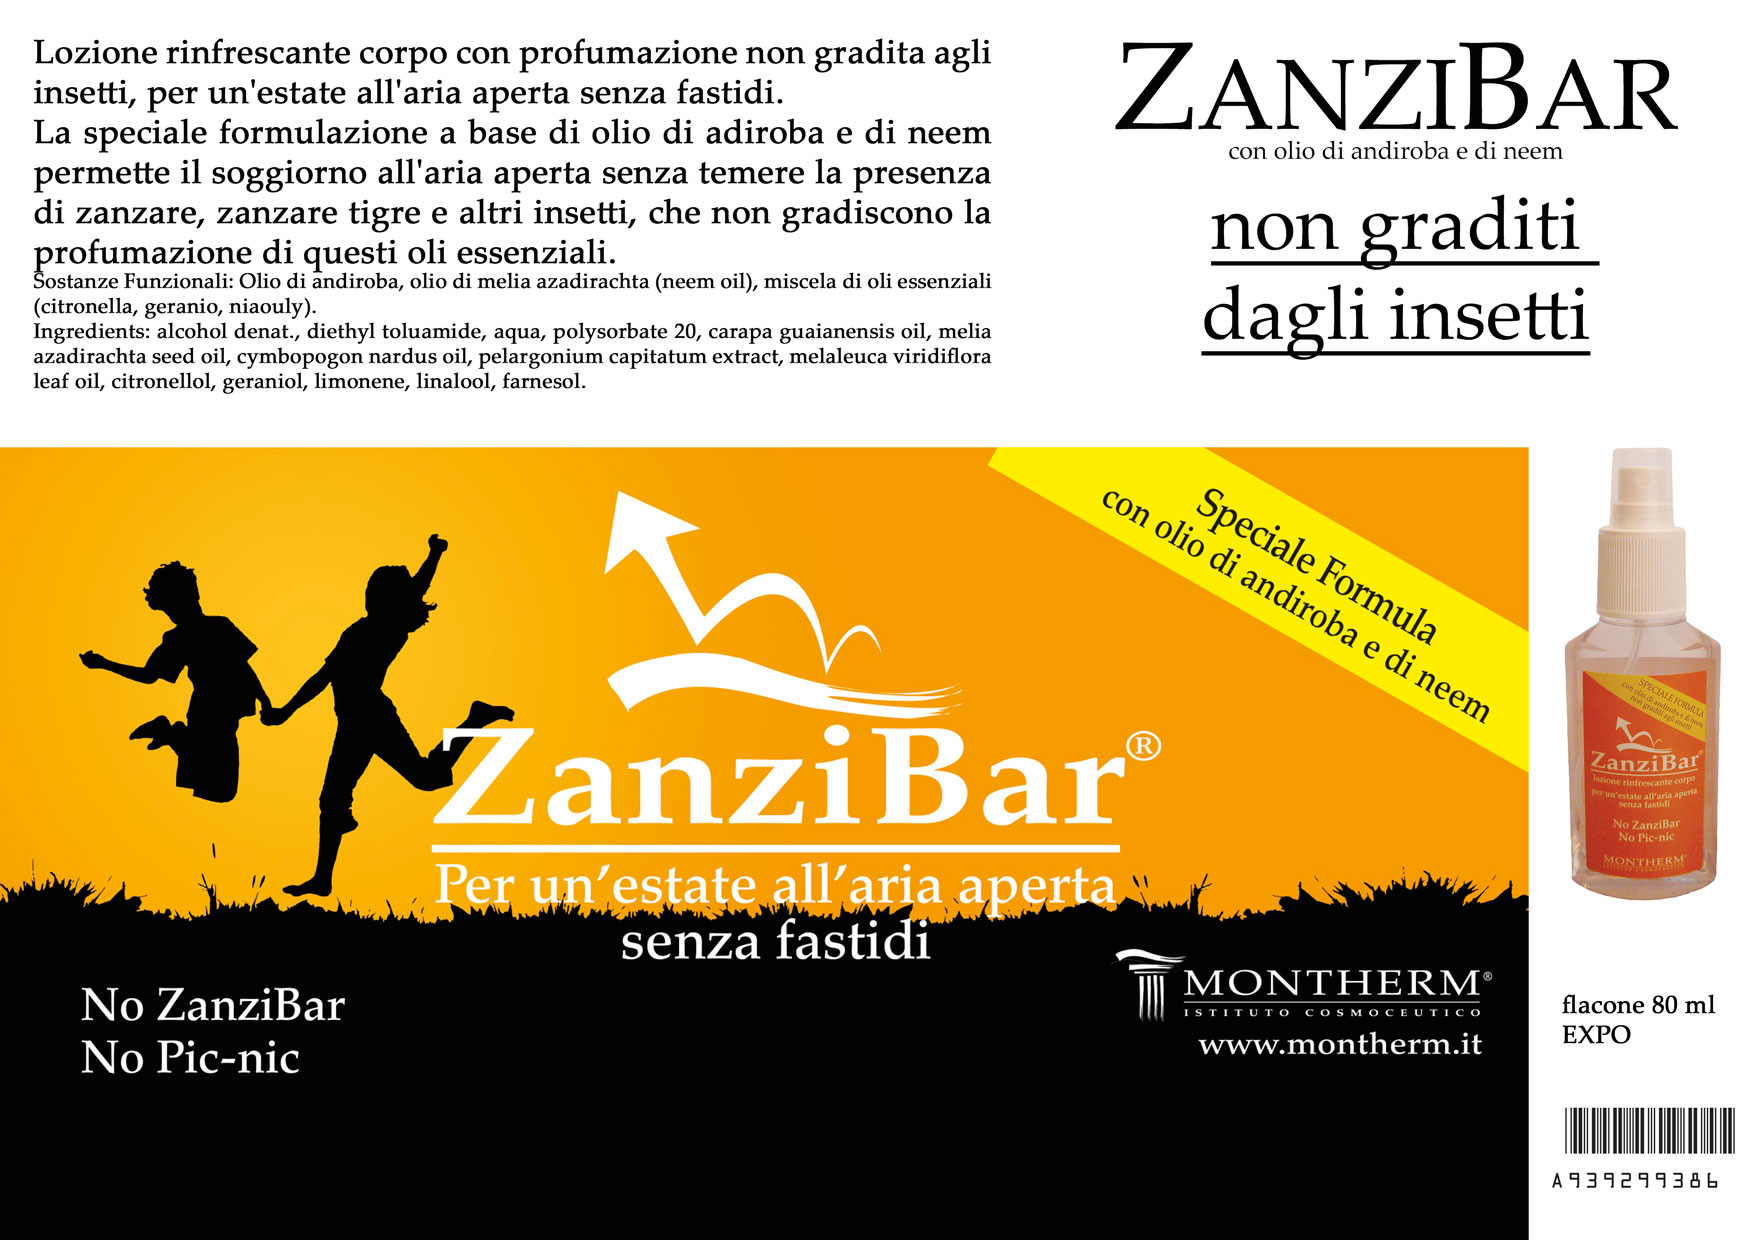 Scheda-X-catalogo-zanzibar-new